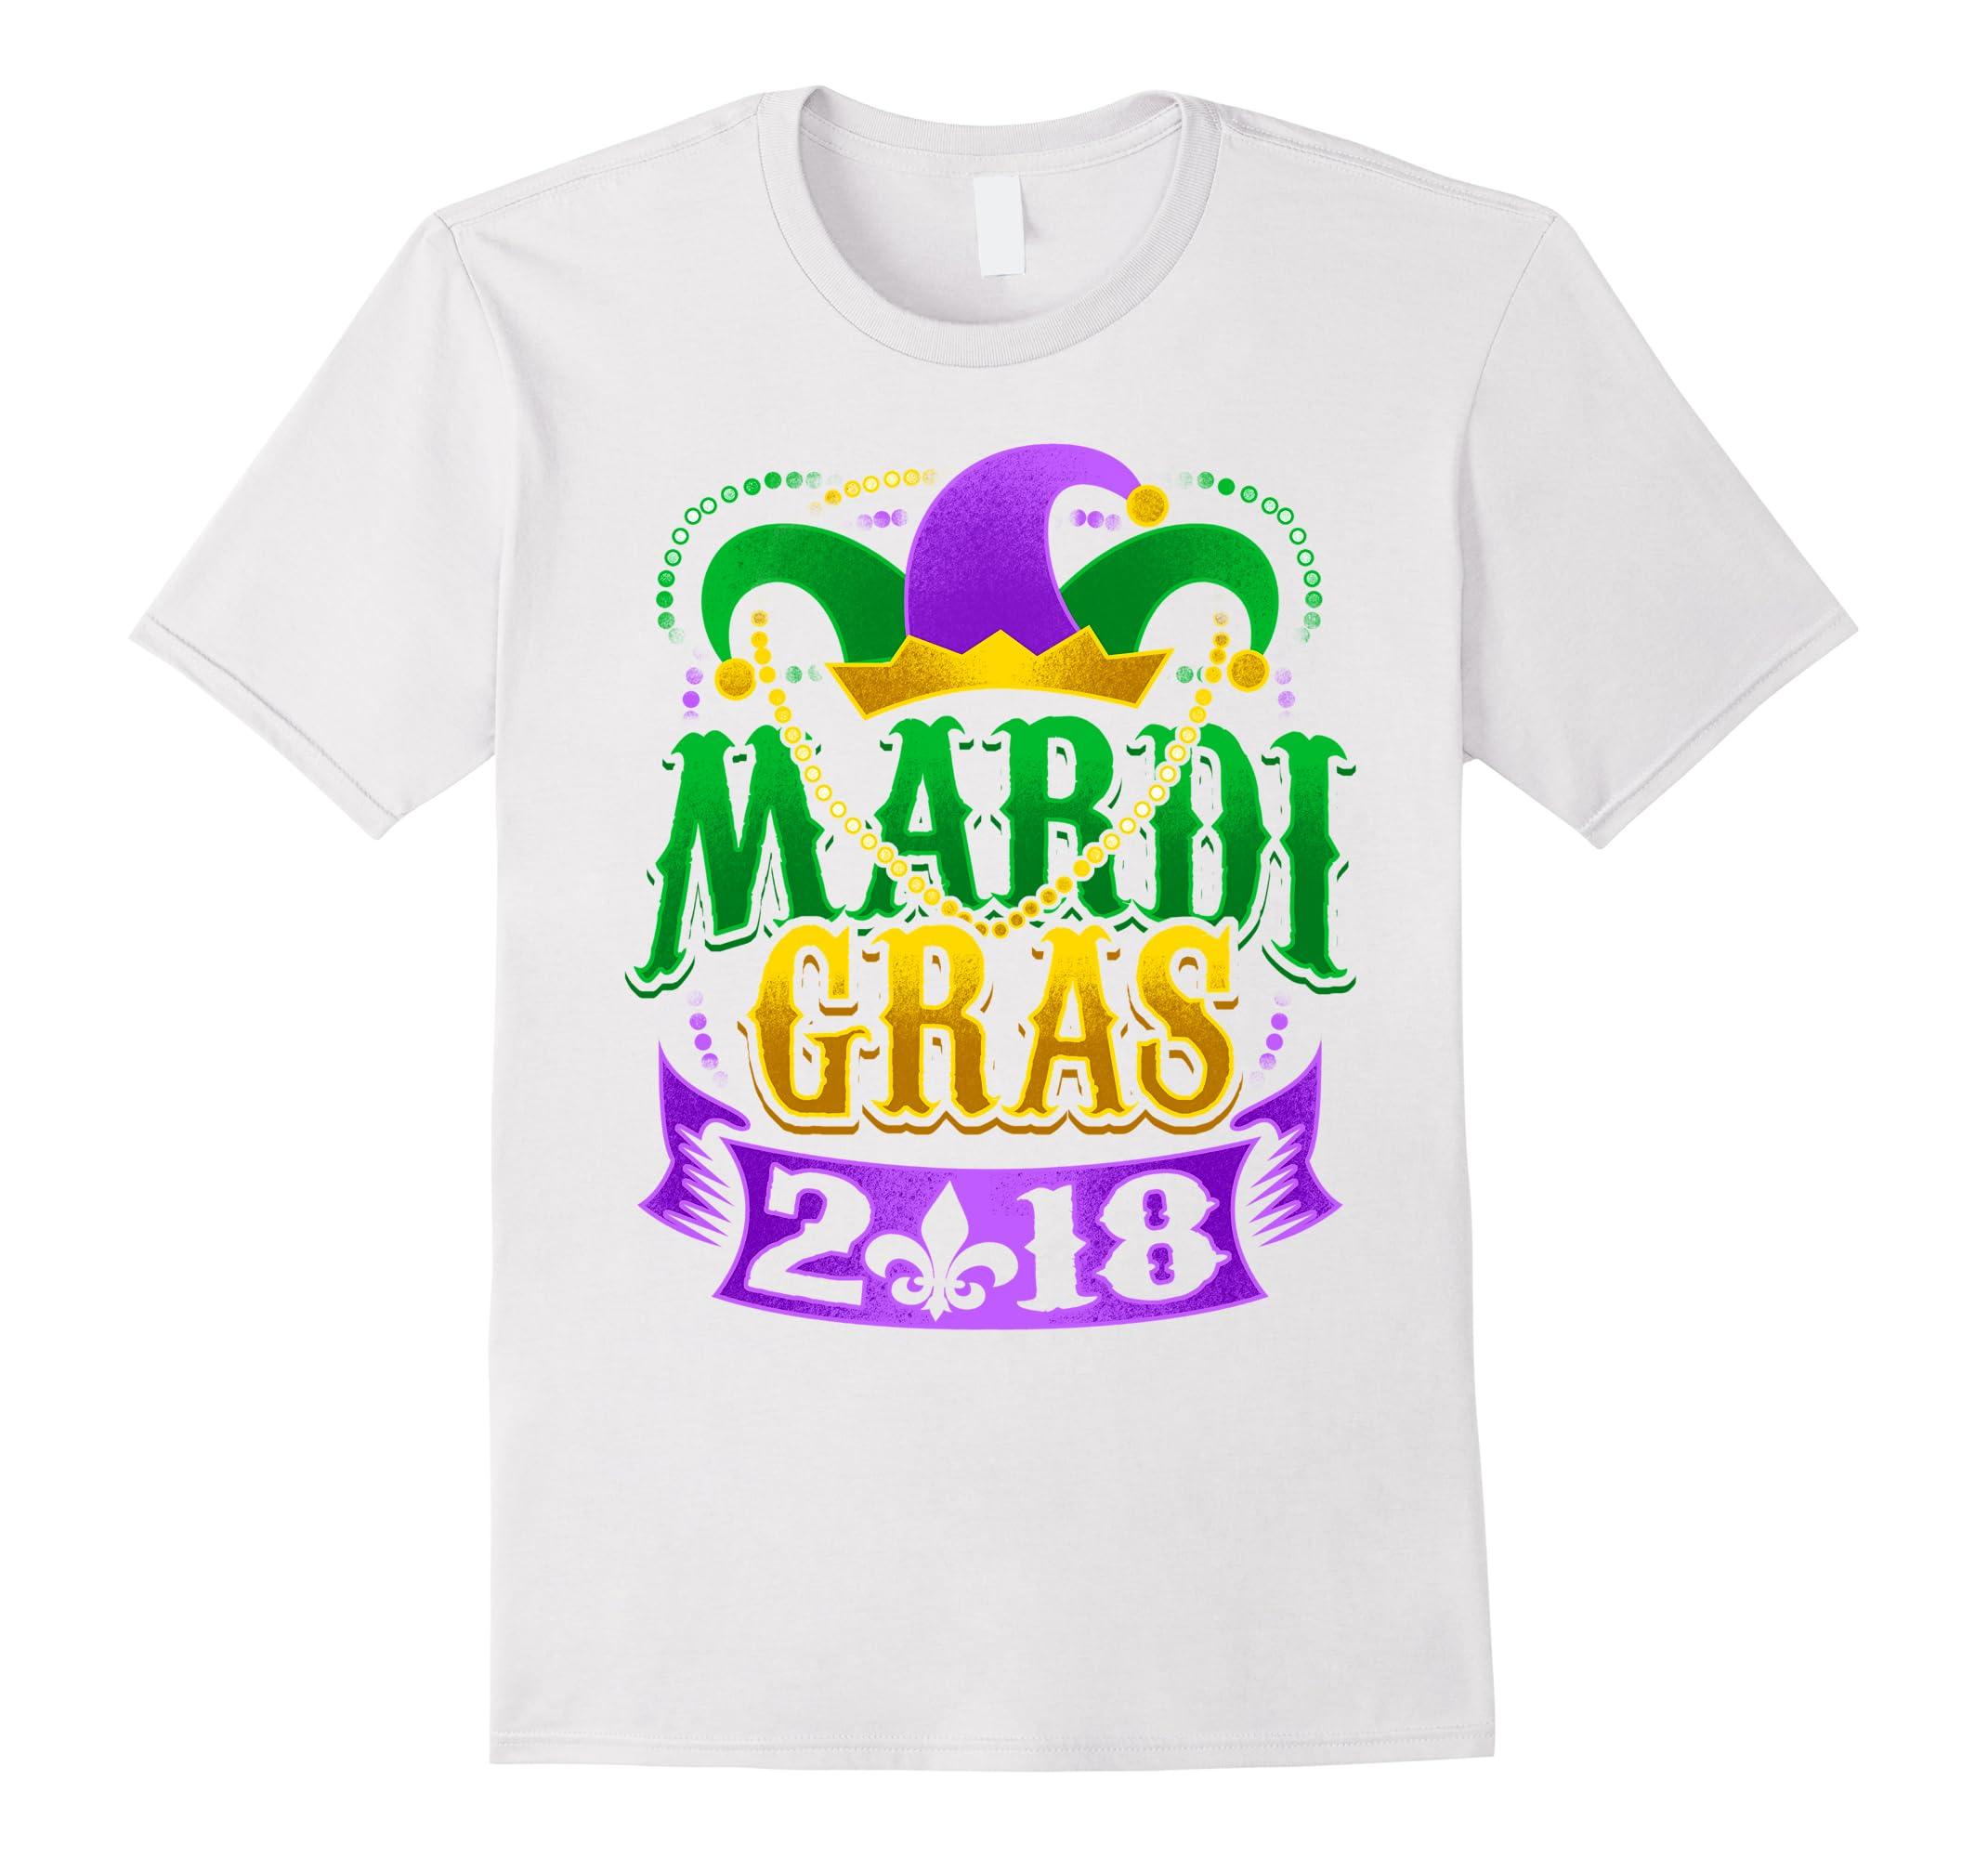 85ebc67af Mardi Gras Rugby Shirt Long Sleeve White